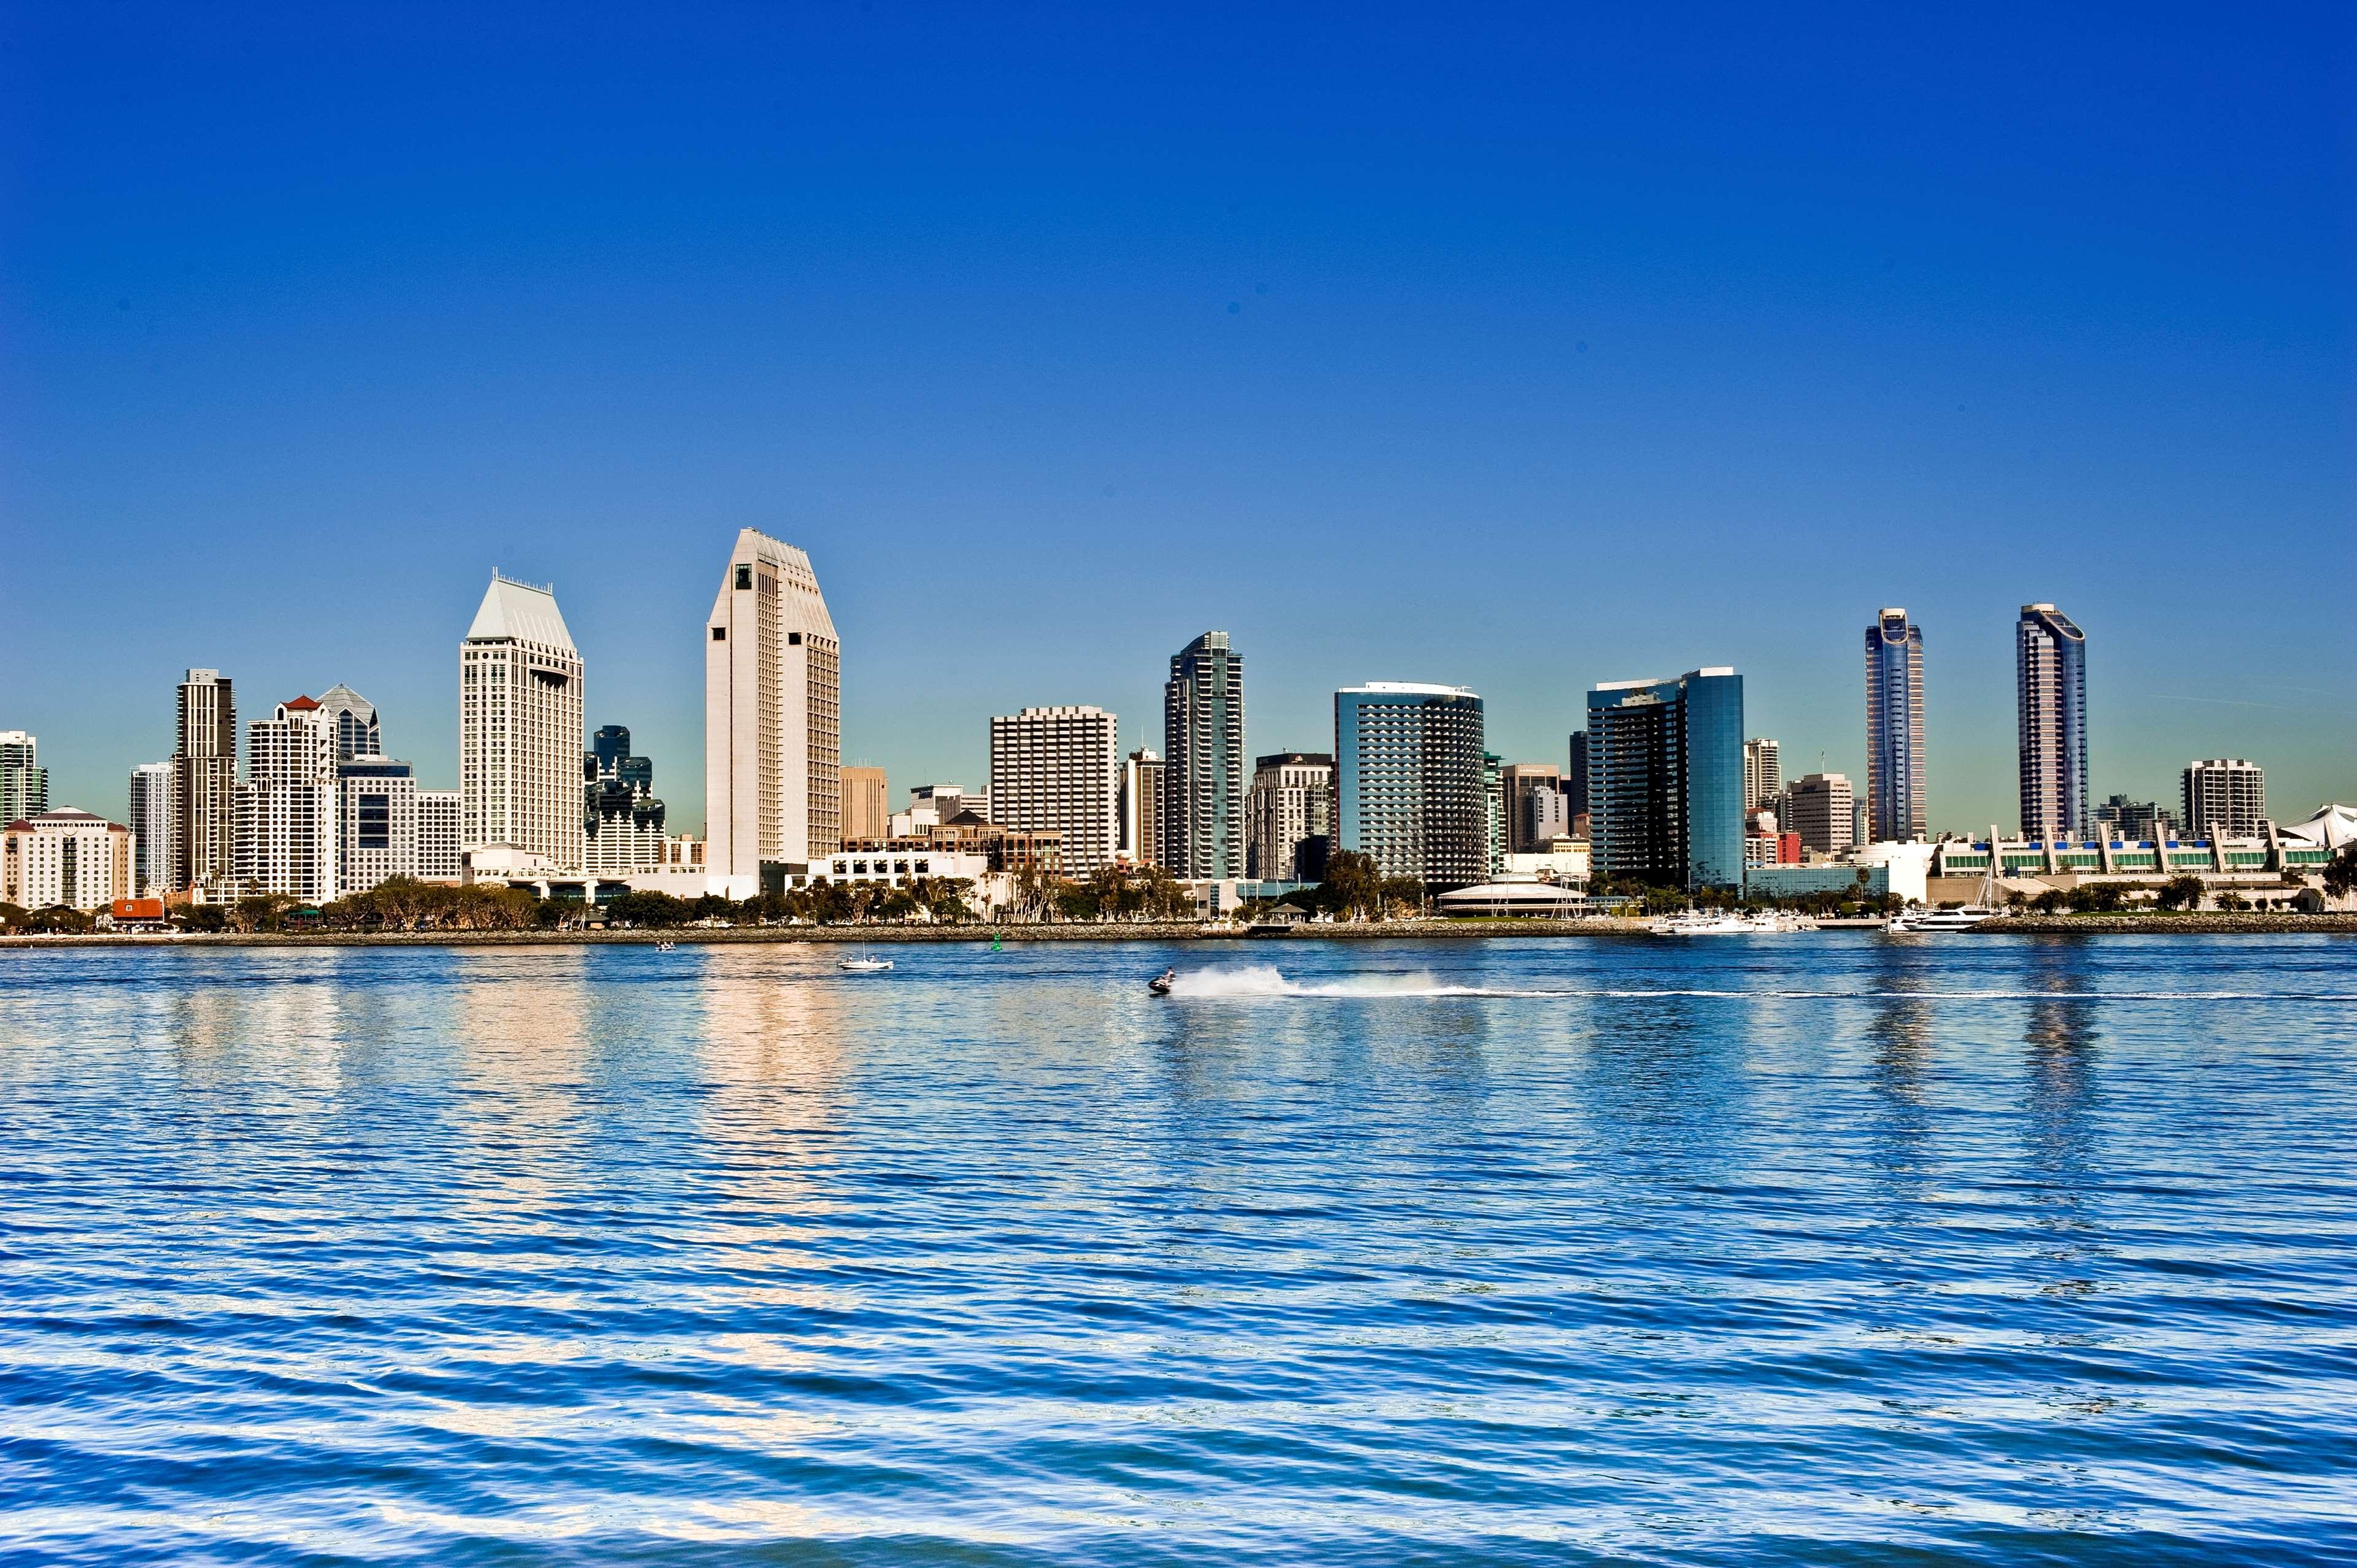 San Diego Bayfront Area